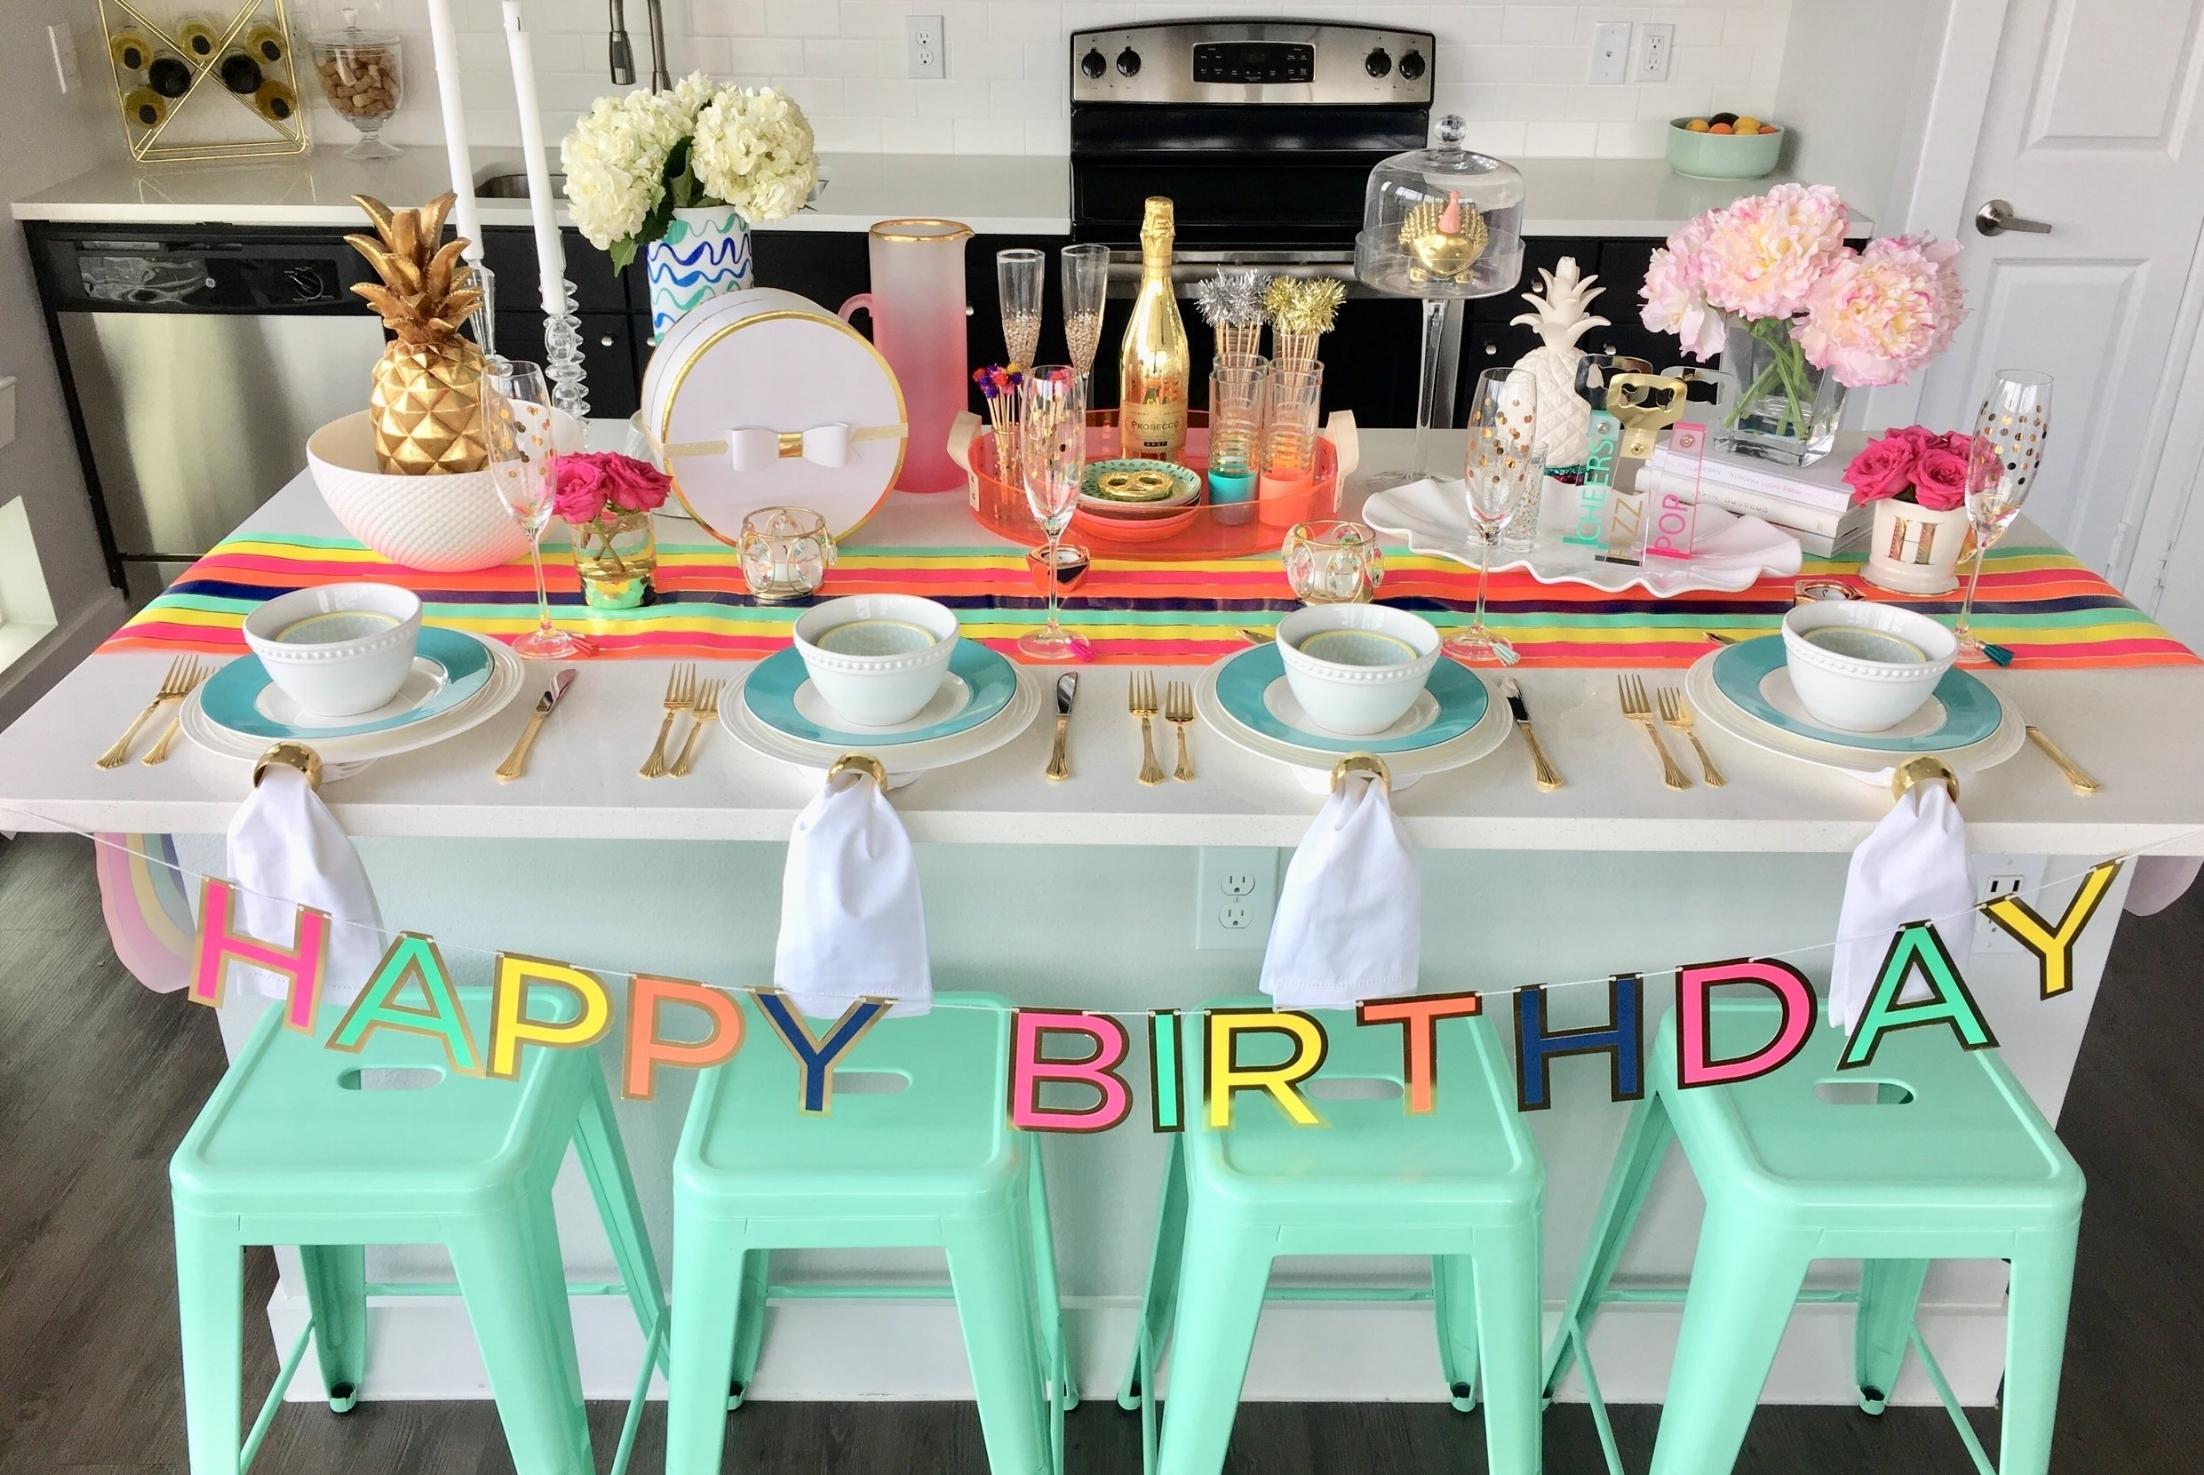 30th BIRTHDAY PARTY - Dallas 30th Birthday Party, September 2017